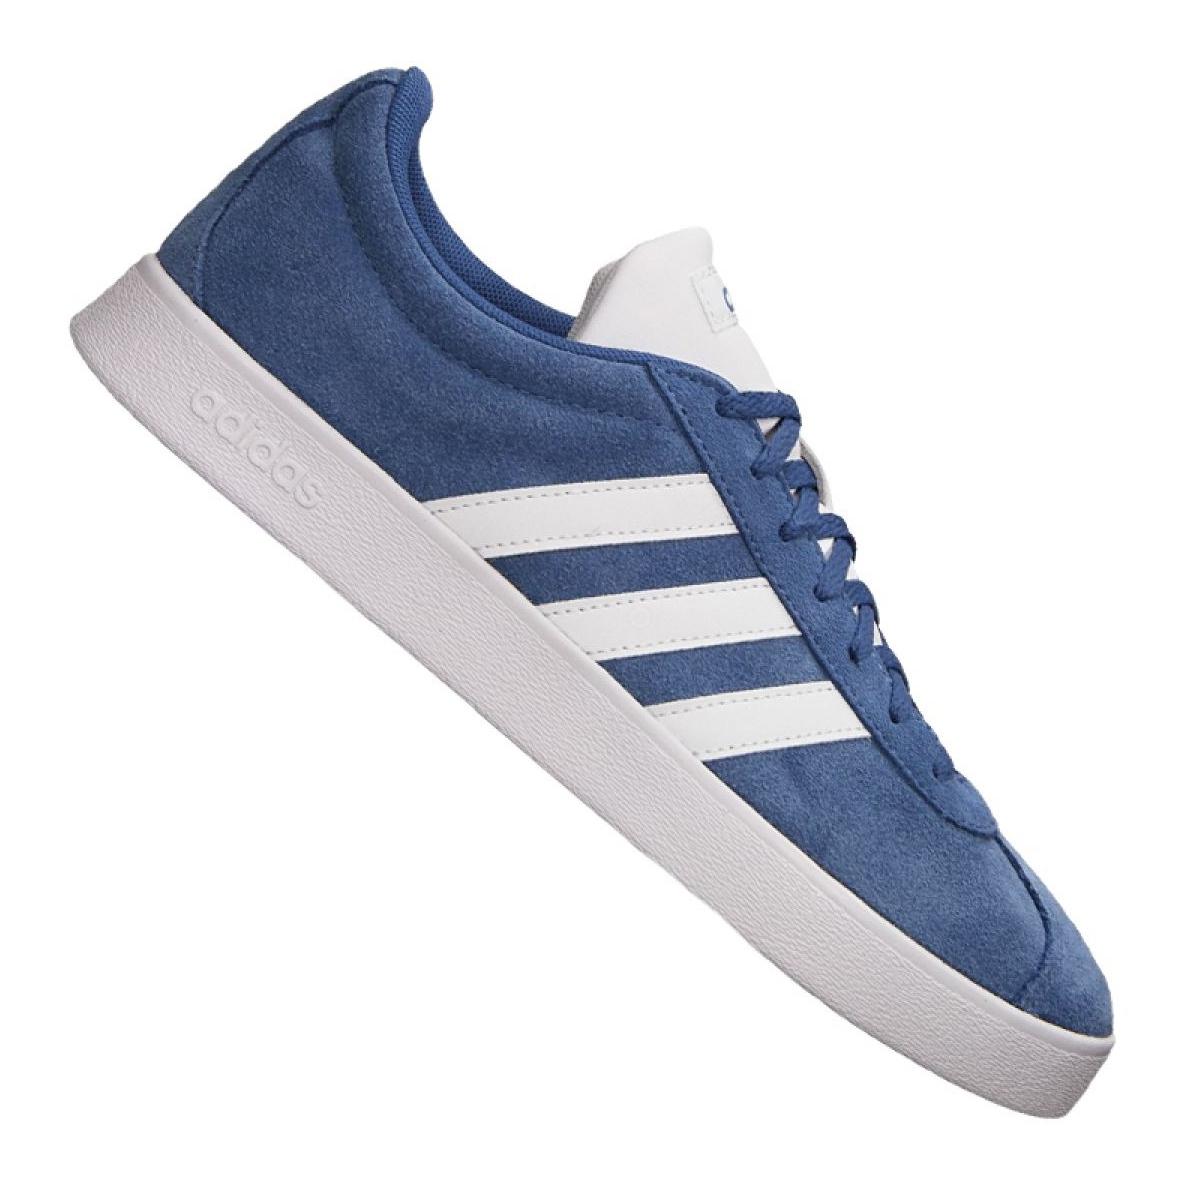 Adidas Vl Court 2.0 M DA9873 shoes blue